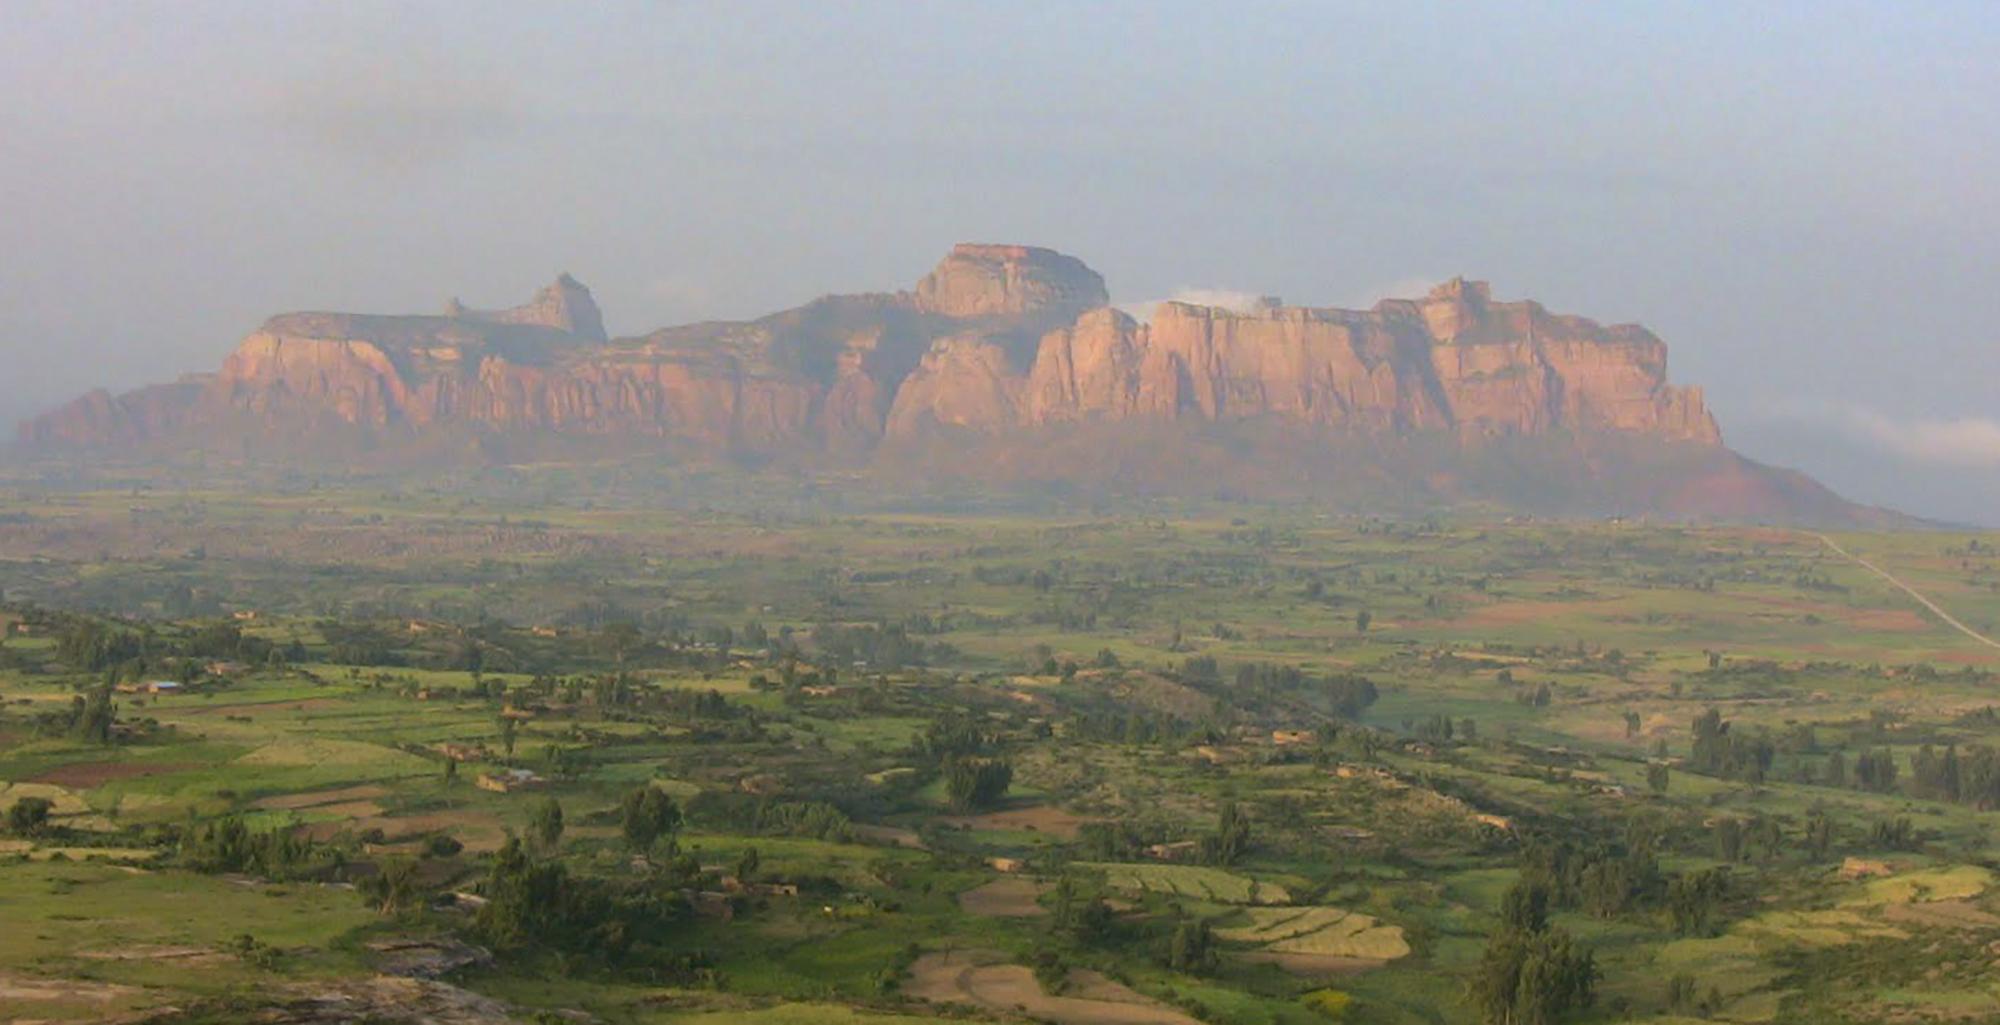 Ethiopia-Gheralta-Mekele-Mount